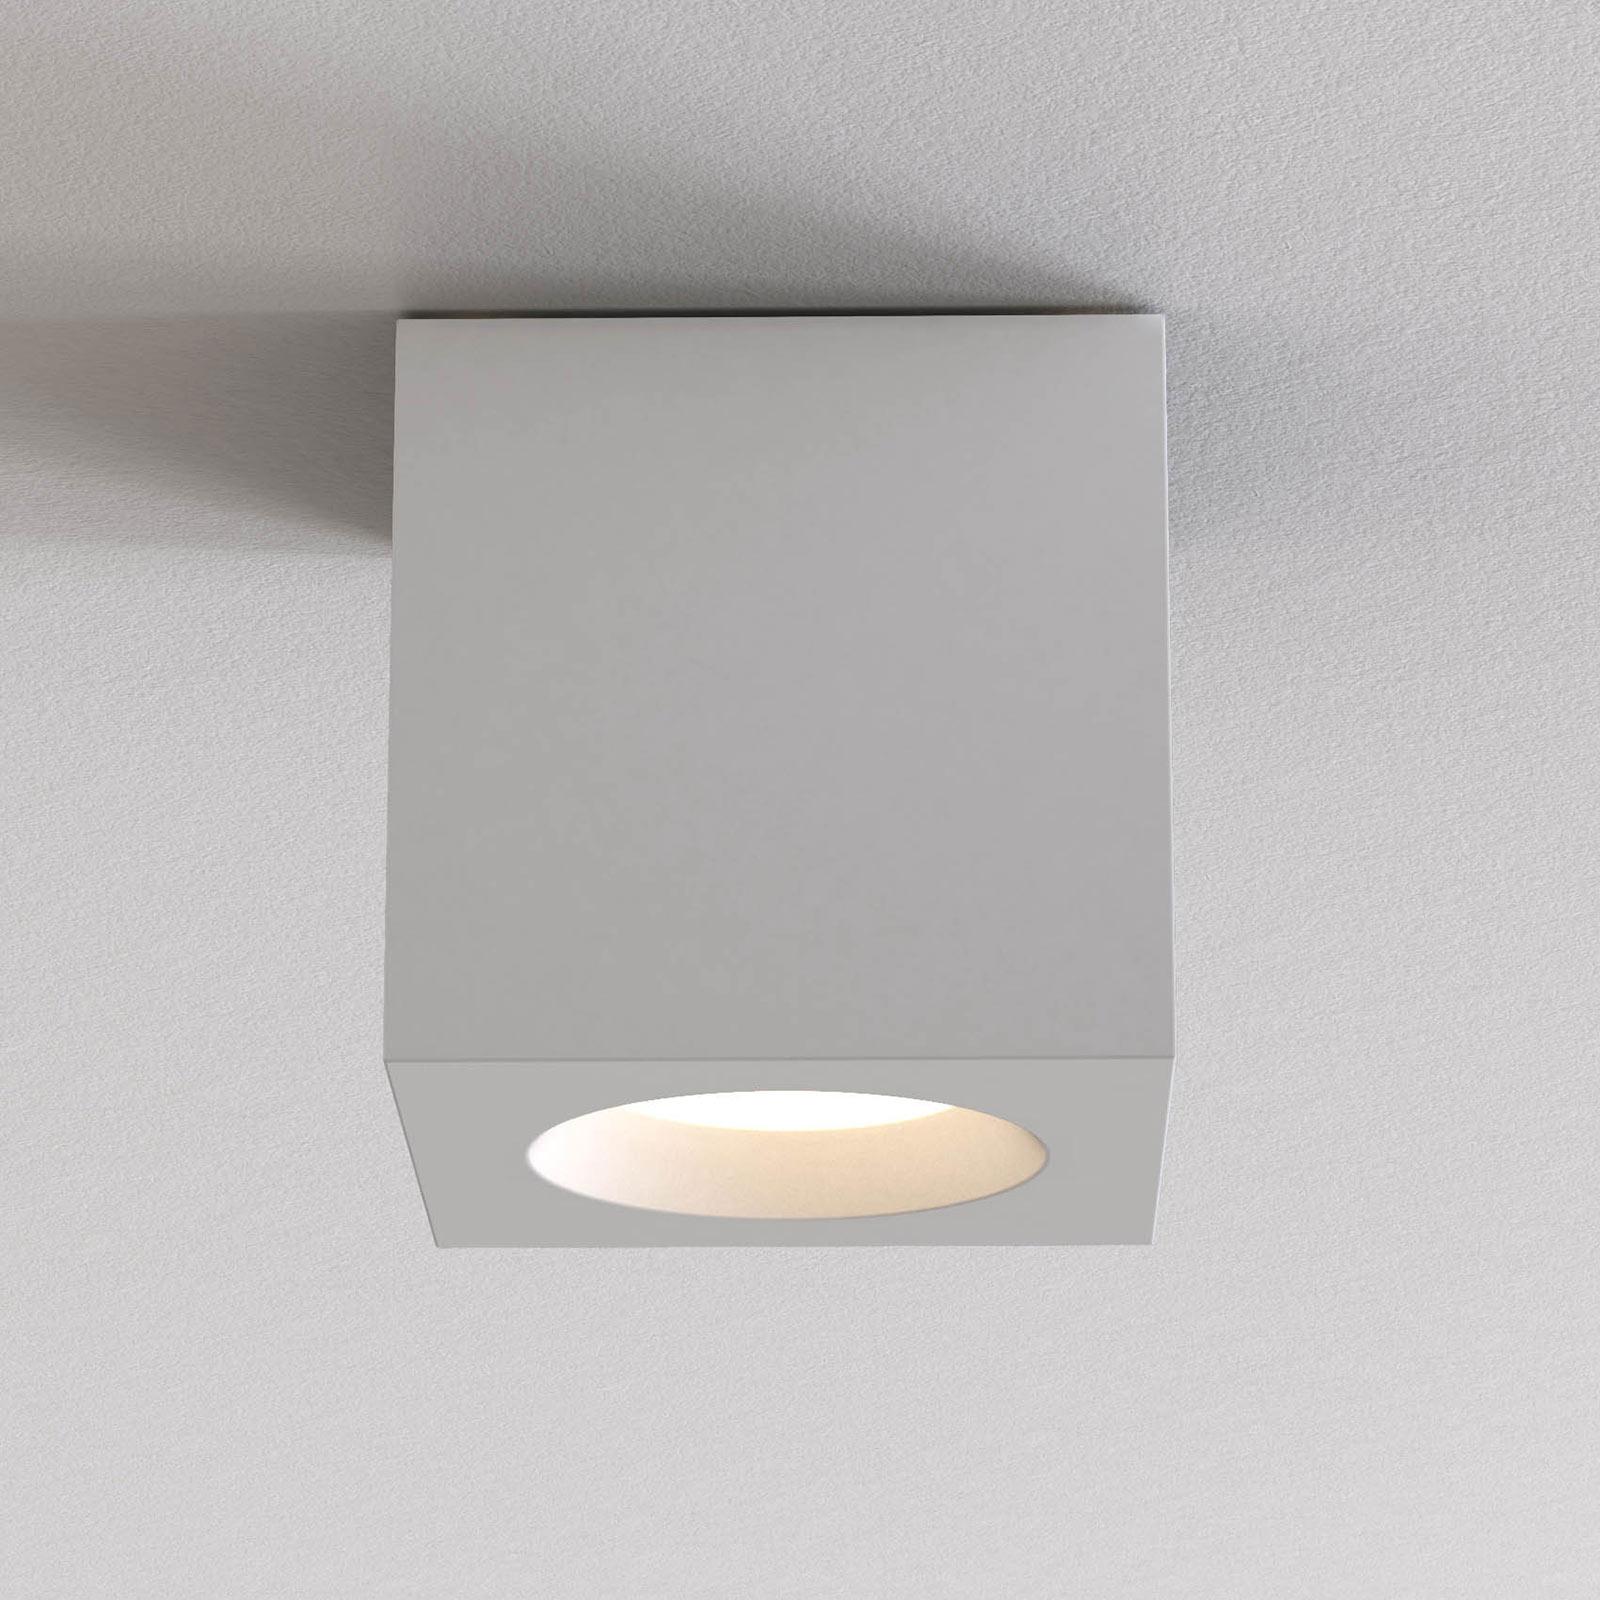 Astro Kos Square II lampa sufitowa, biała matowa